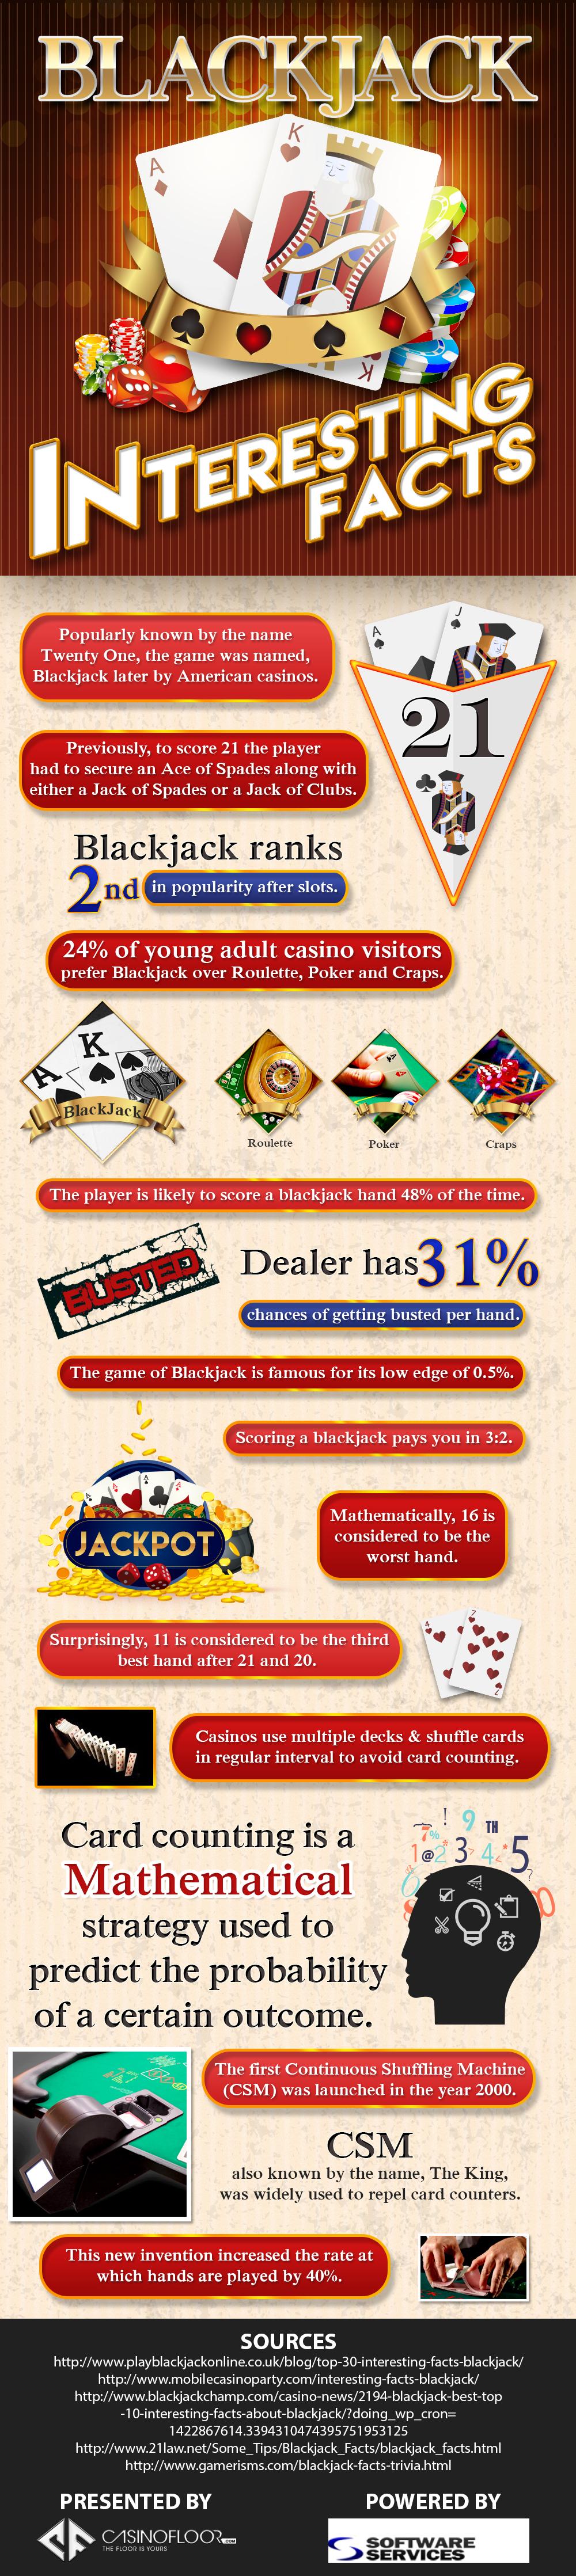 american casino guide video poker